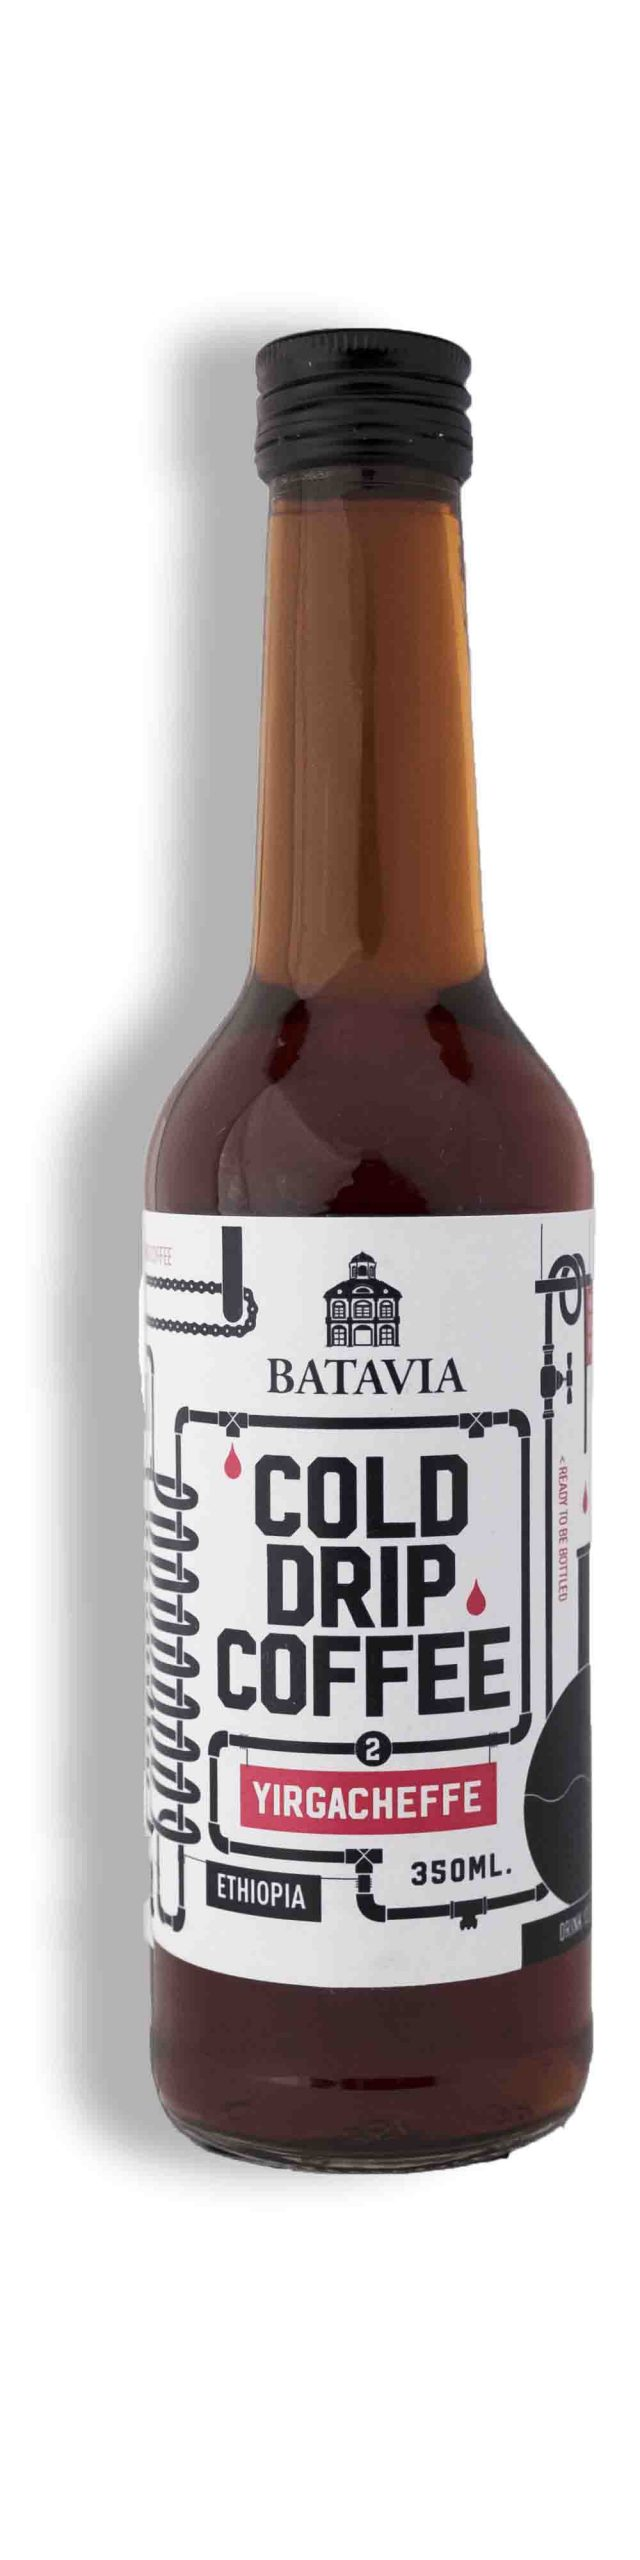 Batavia Cold Drip Coffee Yirgacheffe